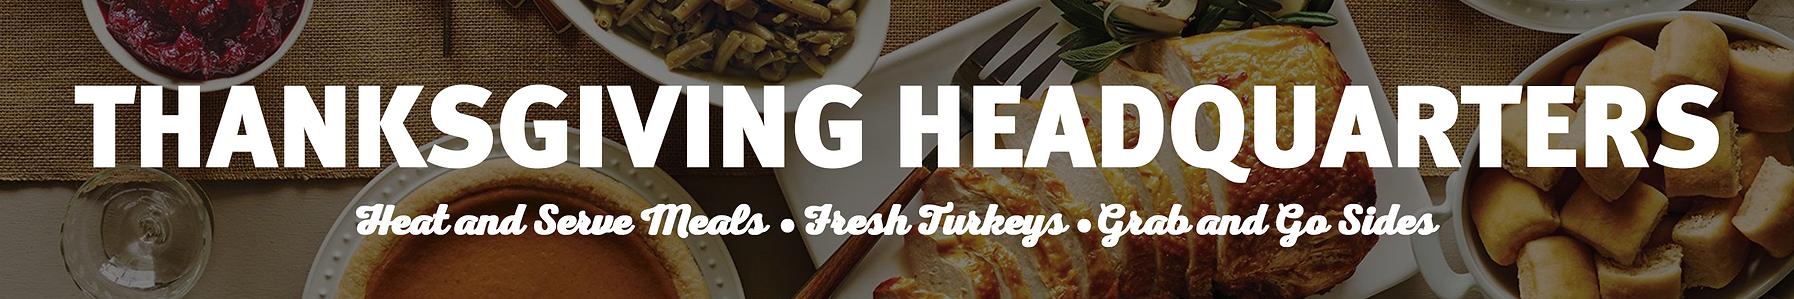 Thanksgiving HQ.png